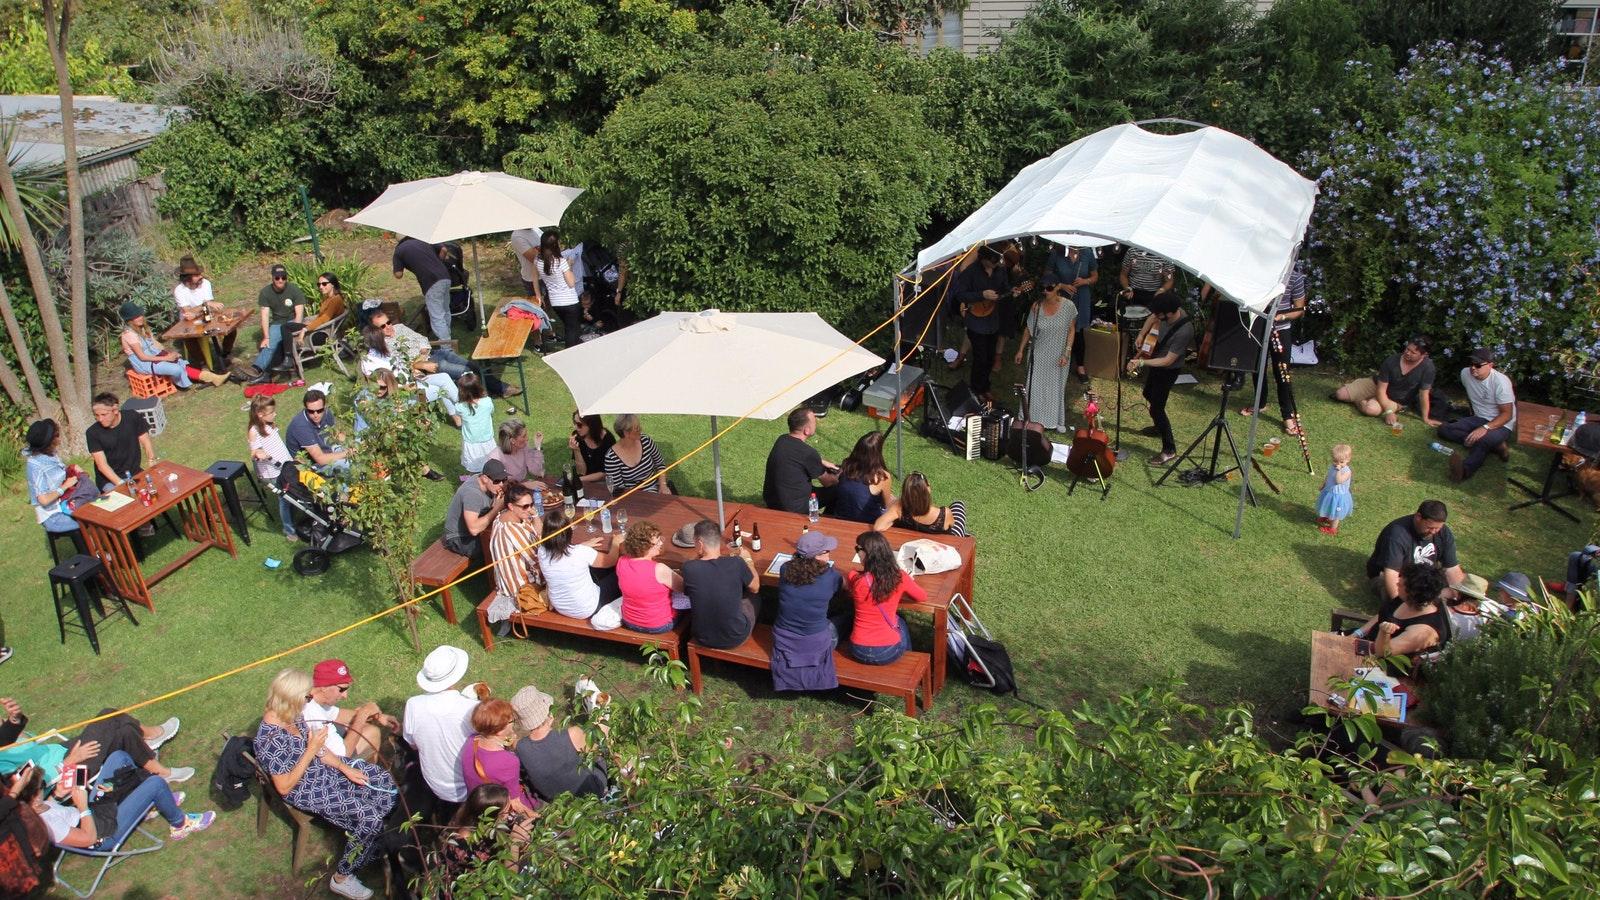 The Wishart Gallery Beer Garden with live tunes